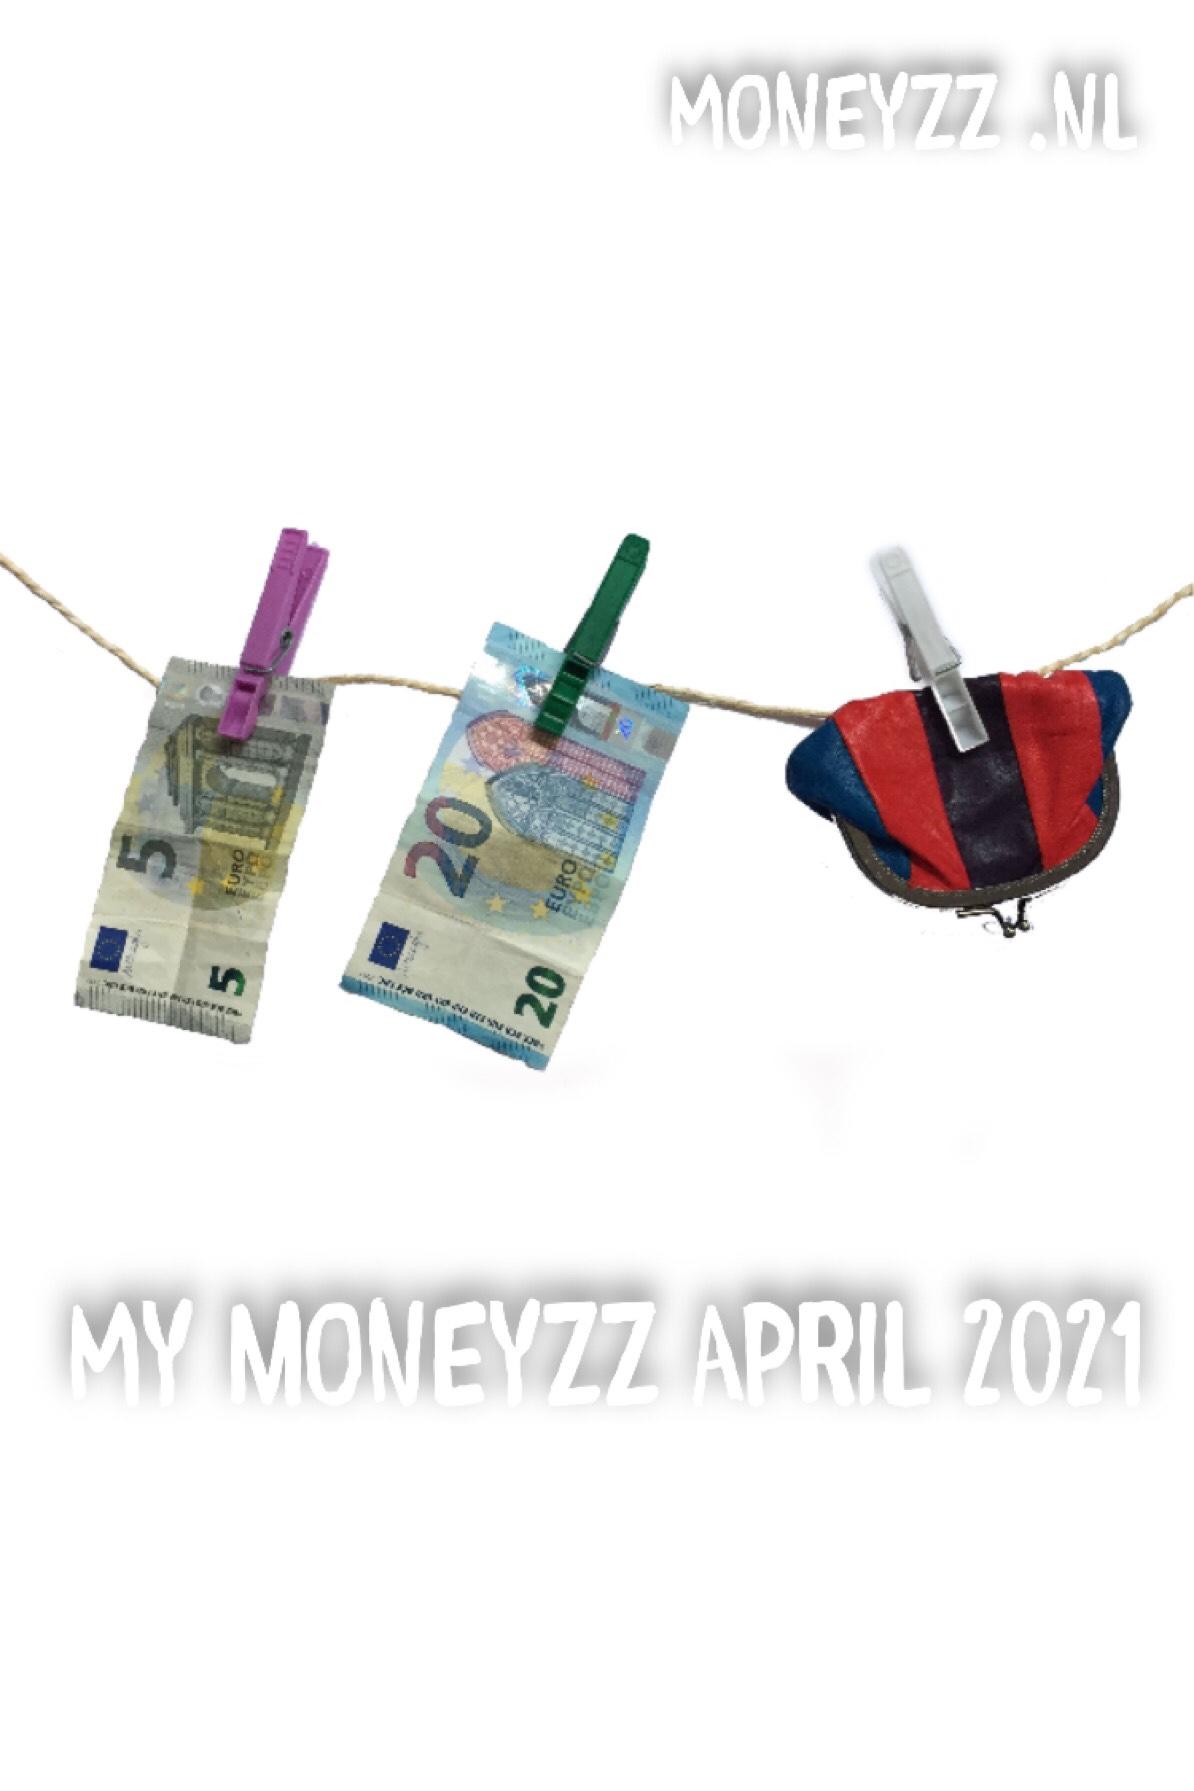 My moneyzz April 2021